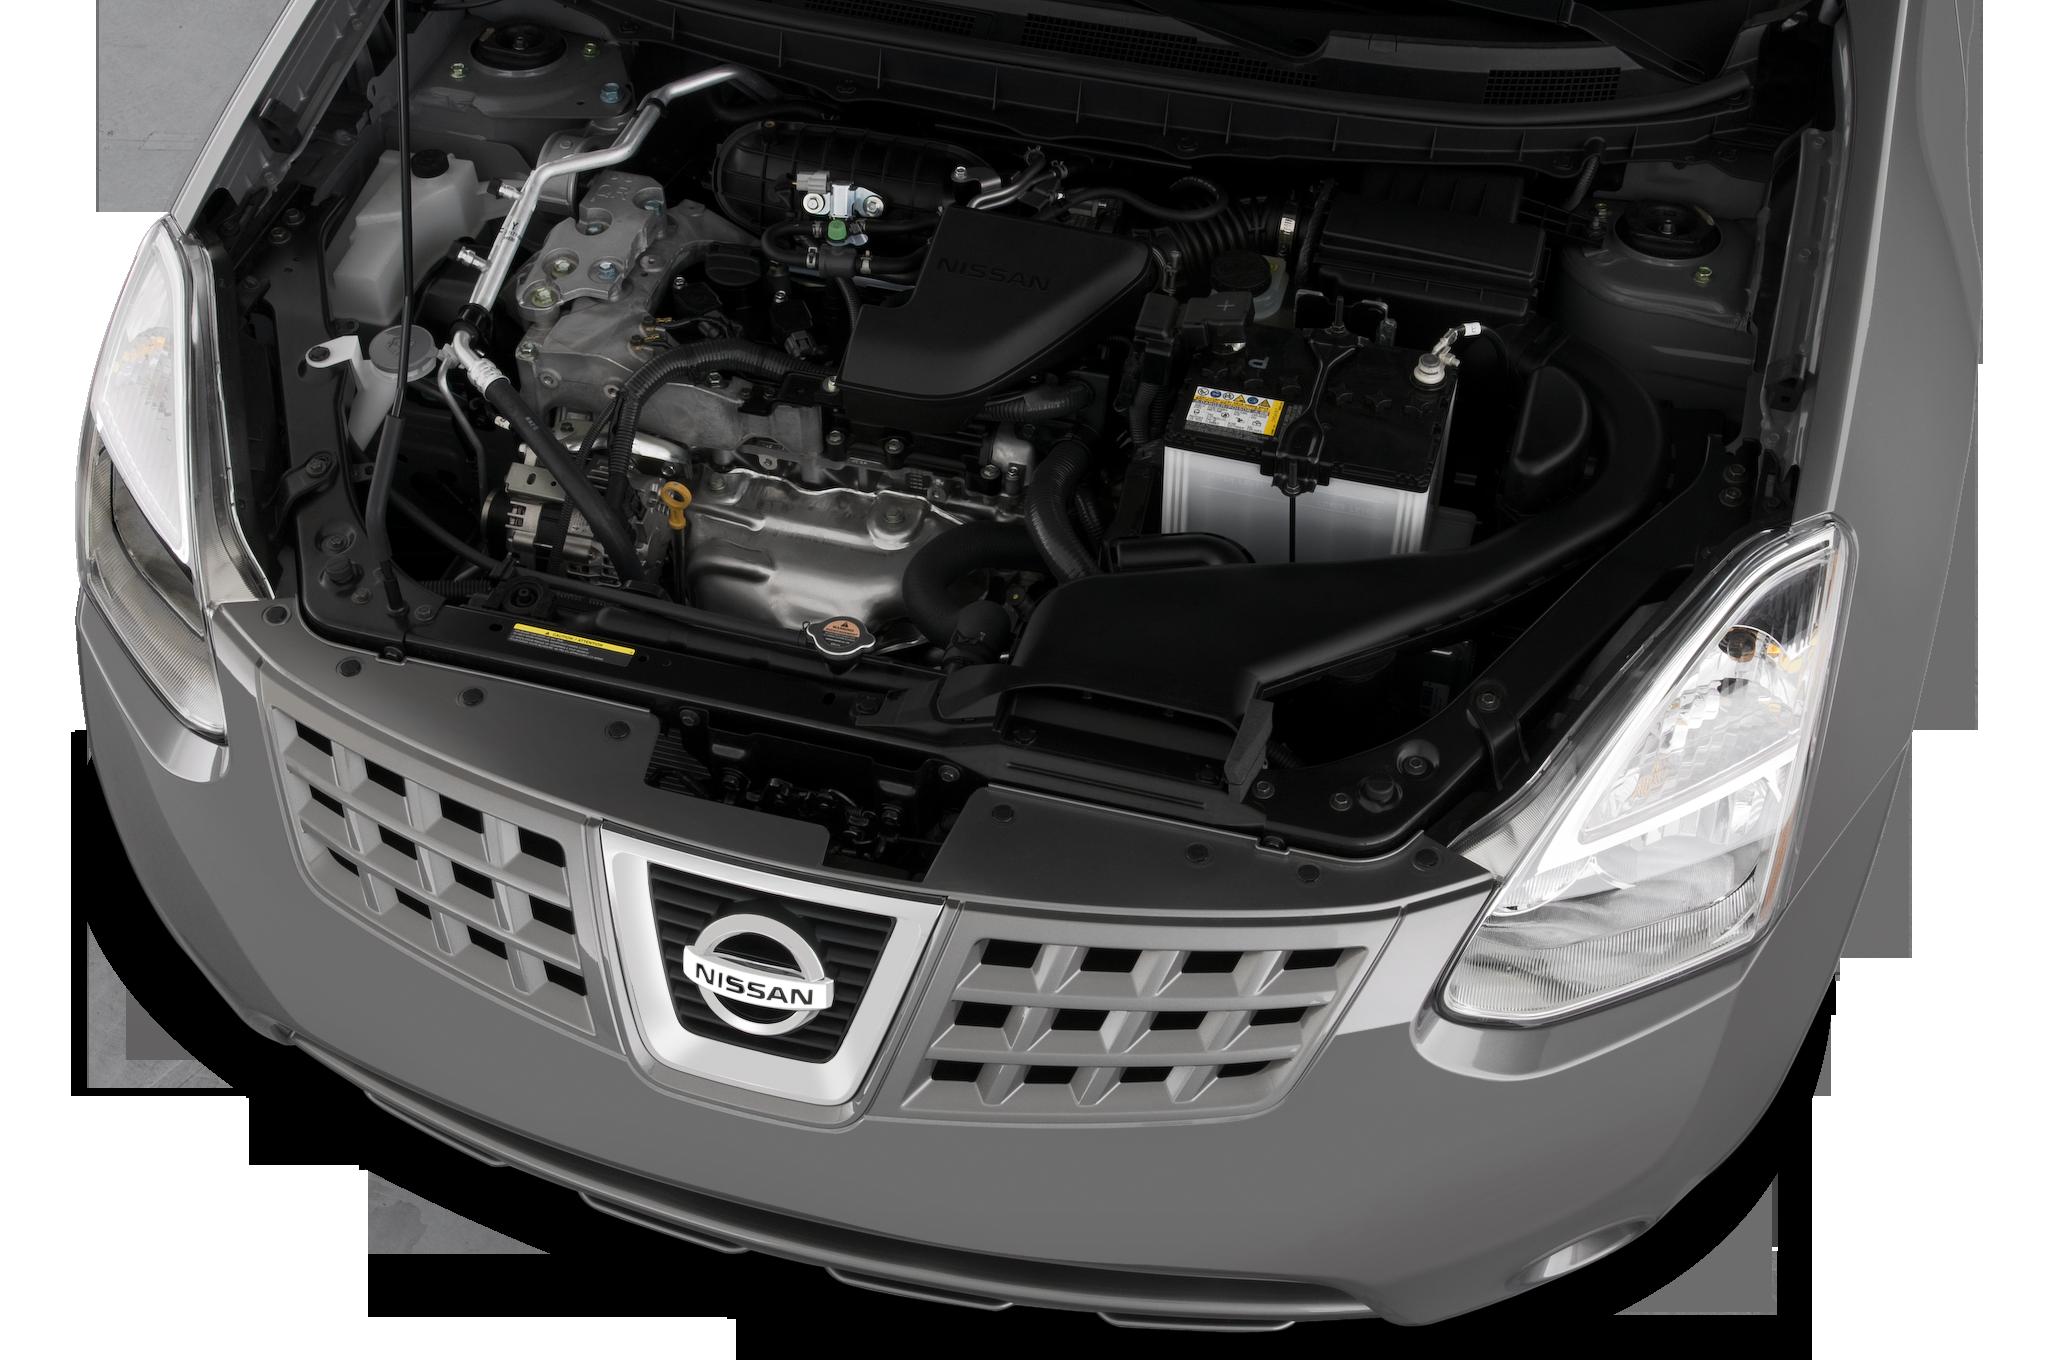 Nissan Announces 2010 Rogue Krom Edition